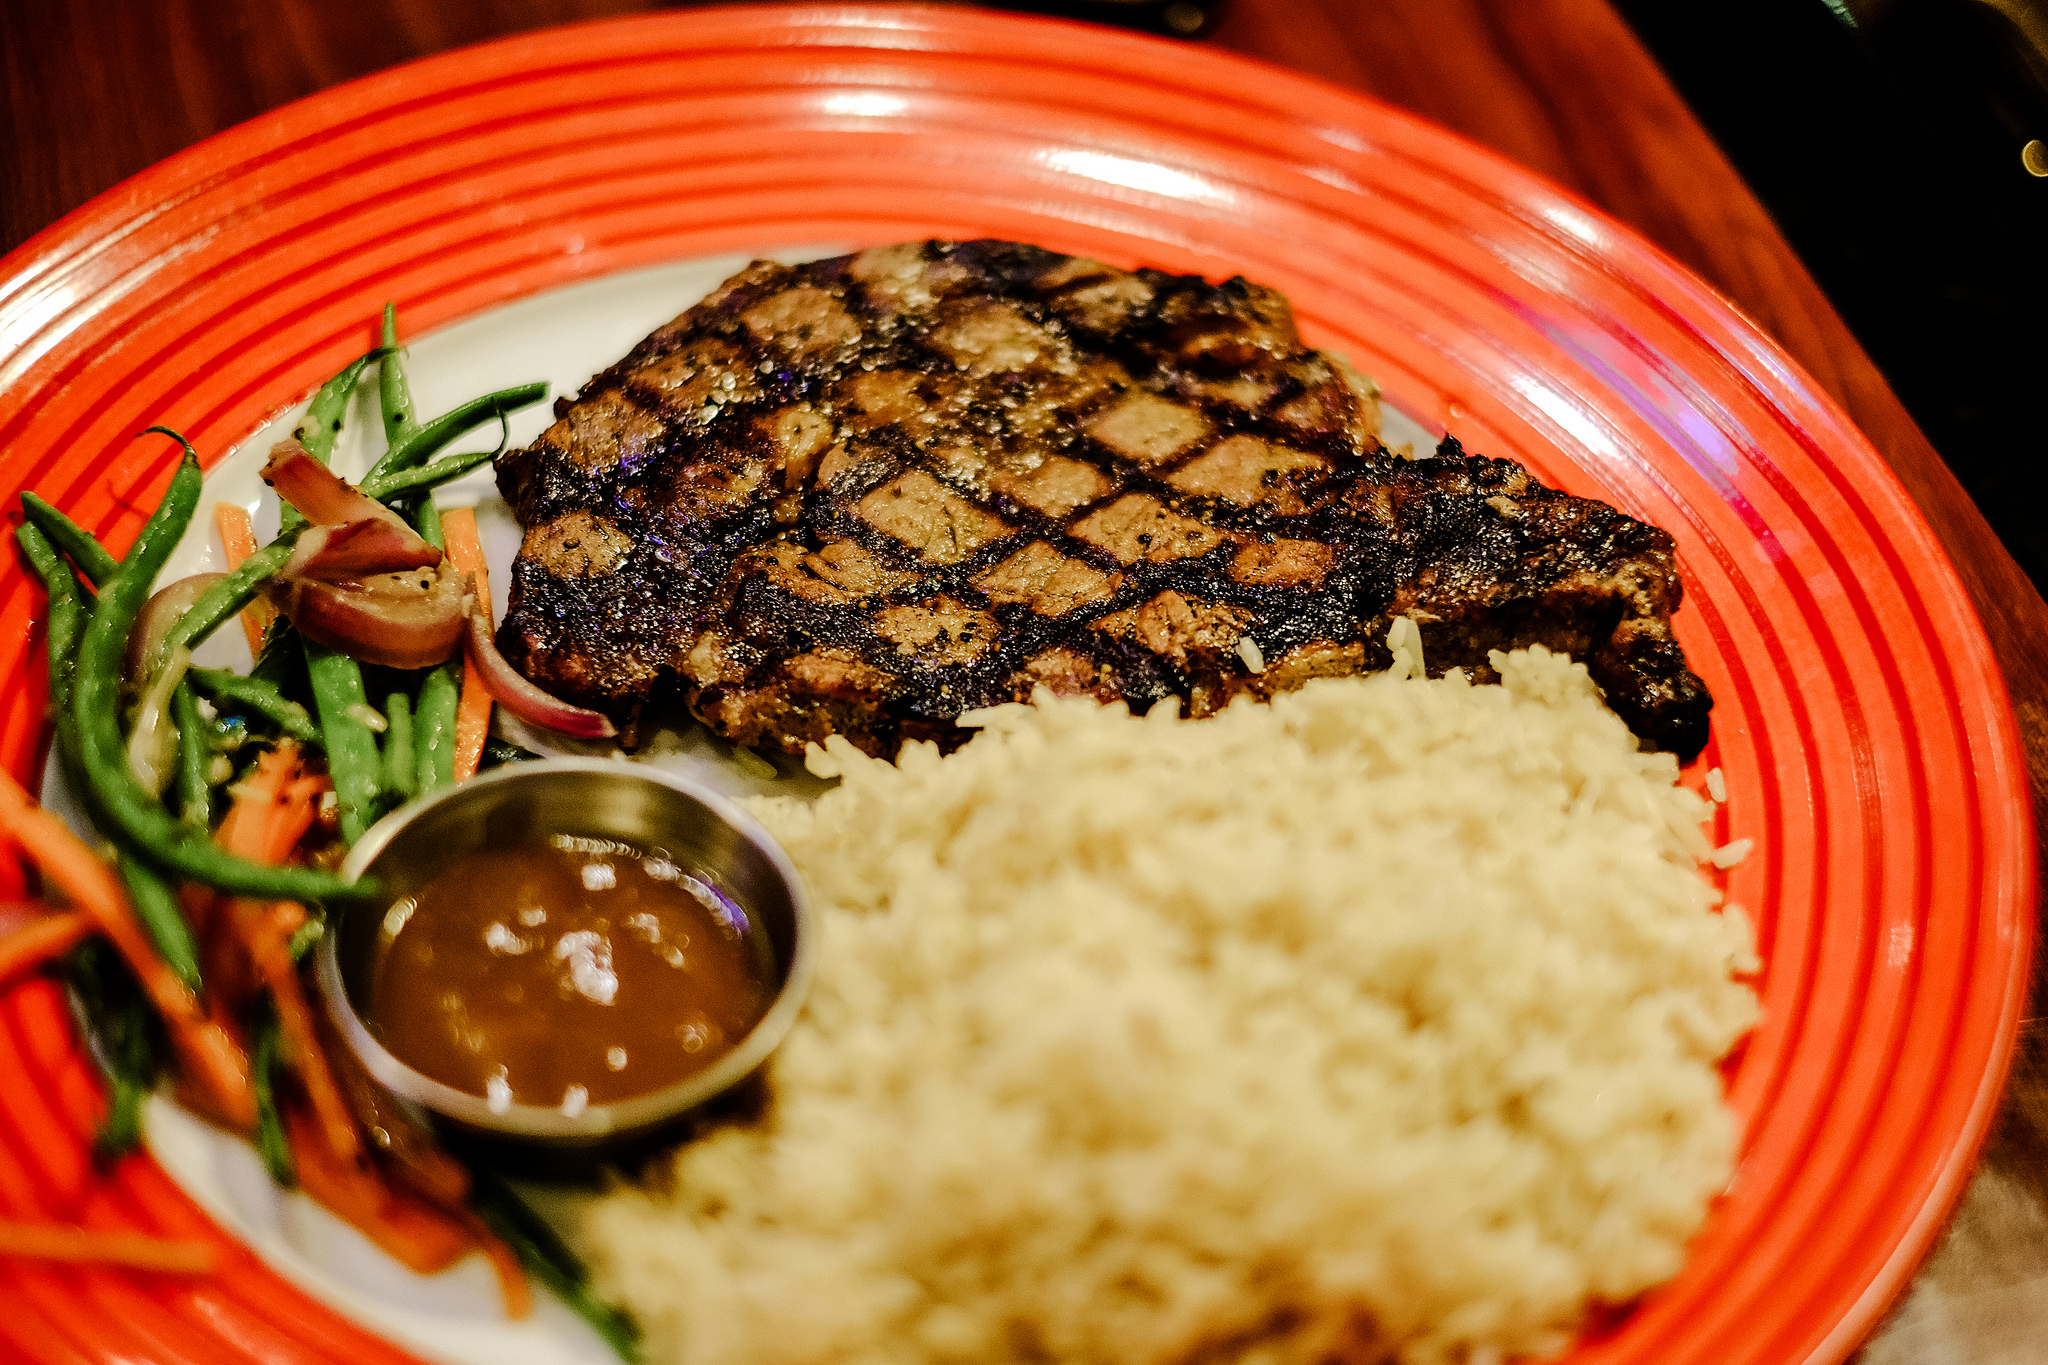 Lion Premium Grills – The Best in Stainless Steel Gas BBQ Grills